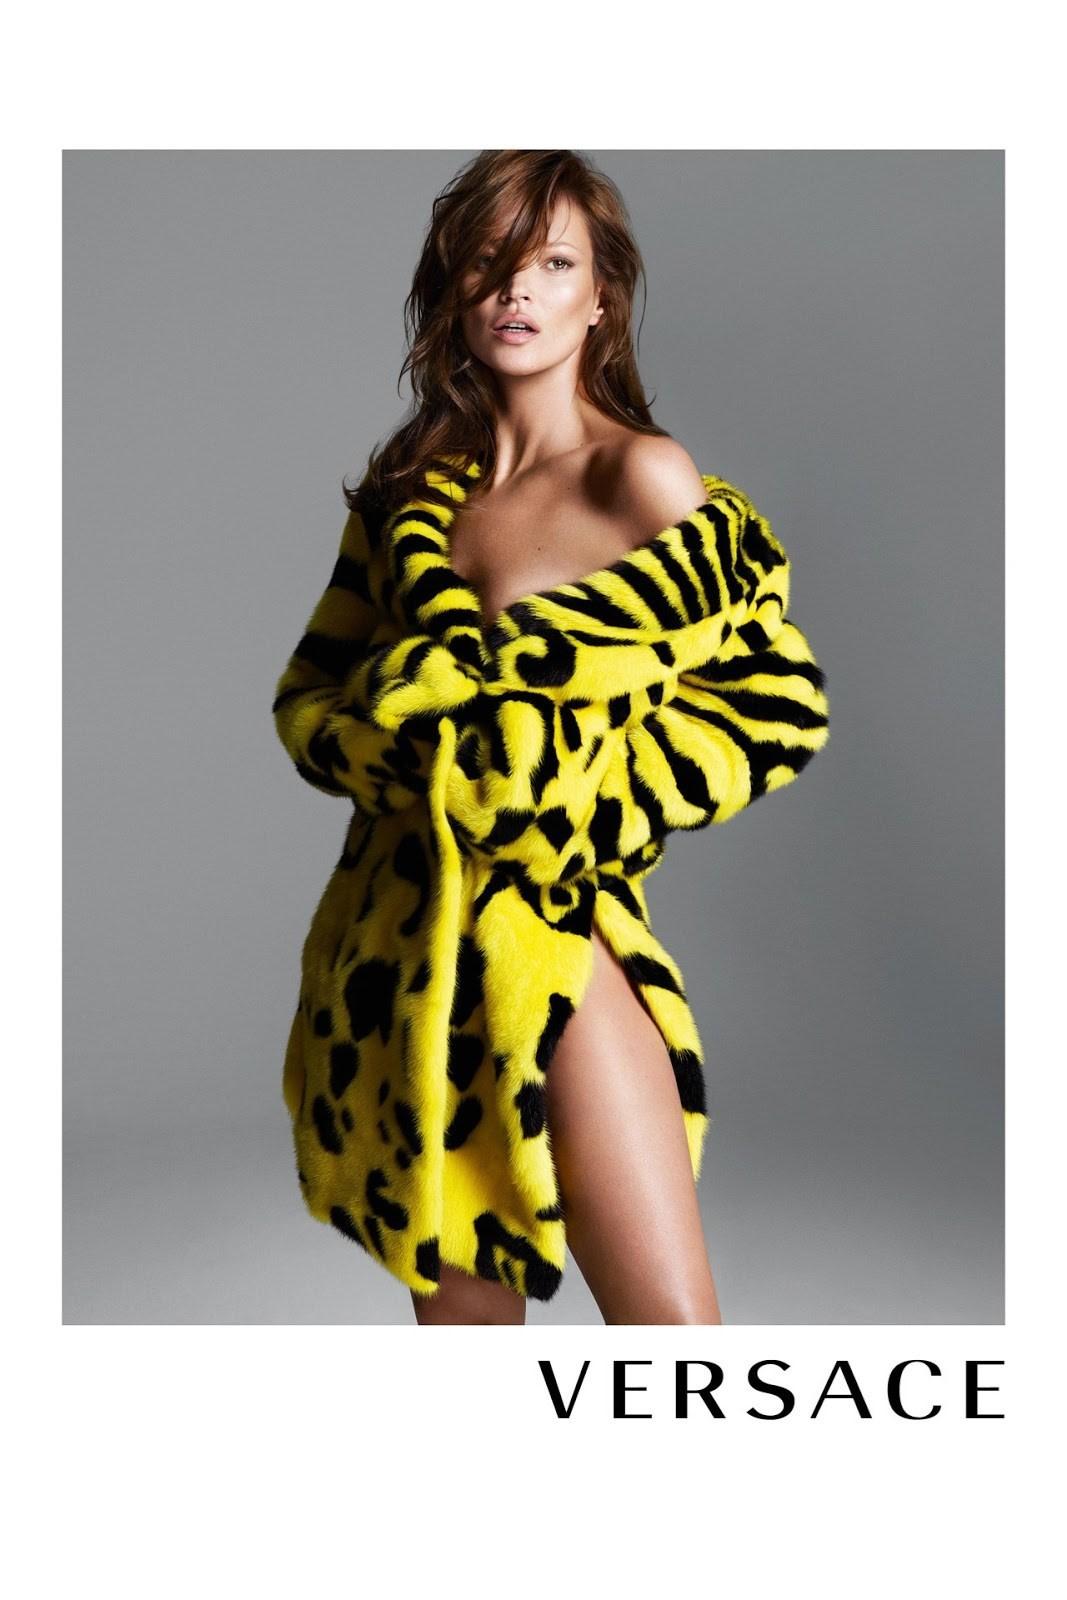 versace fur ad